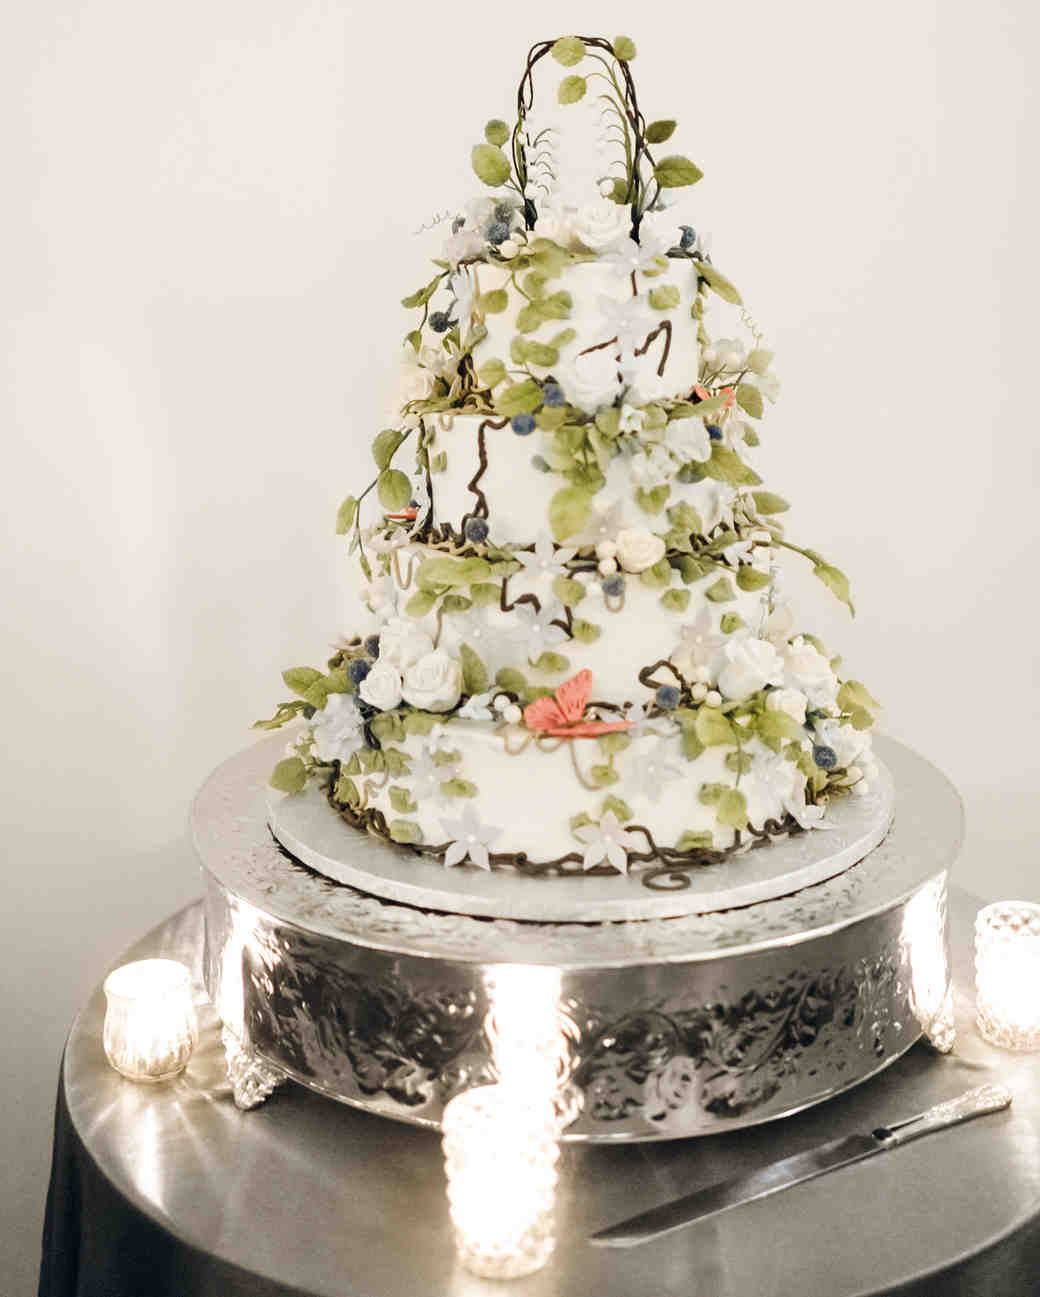 lilly-sean-wedding-cake-00551-s112089-0815.jpg